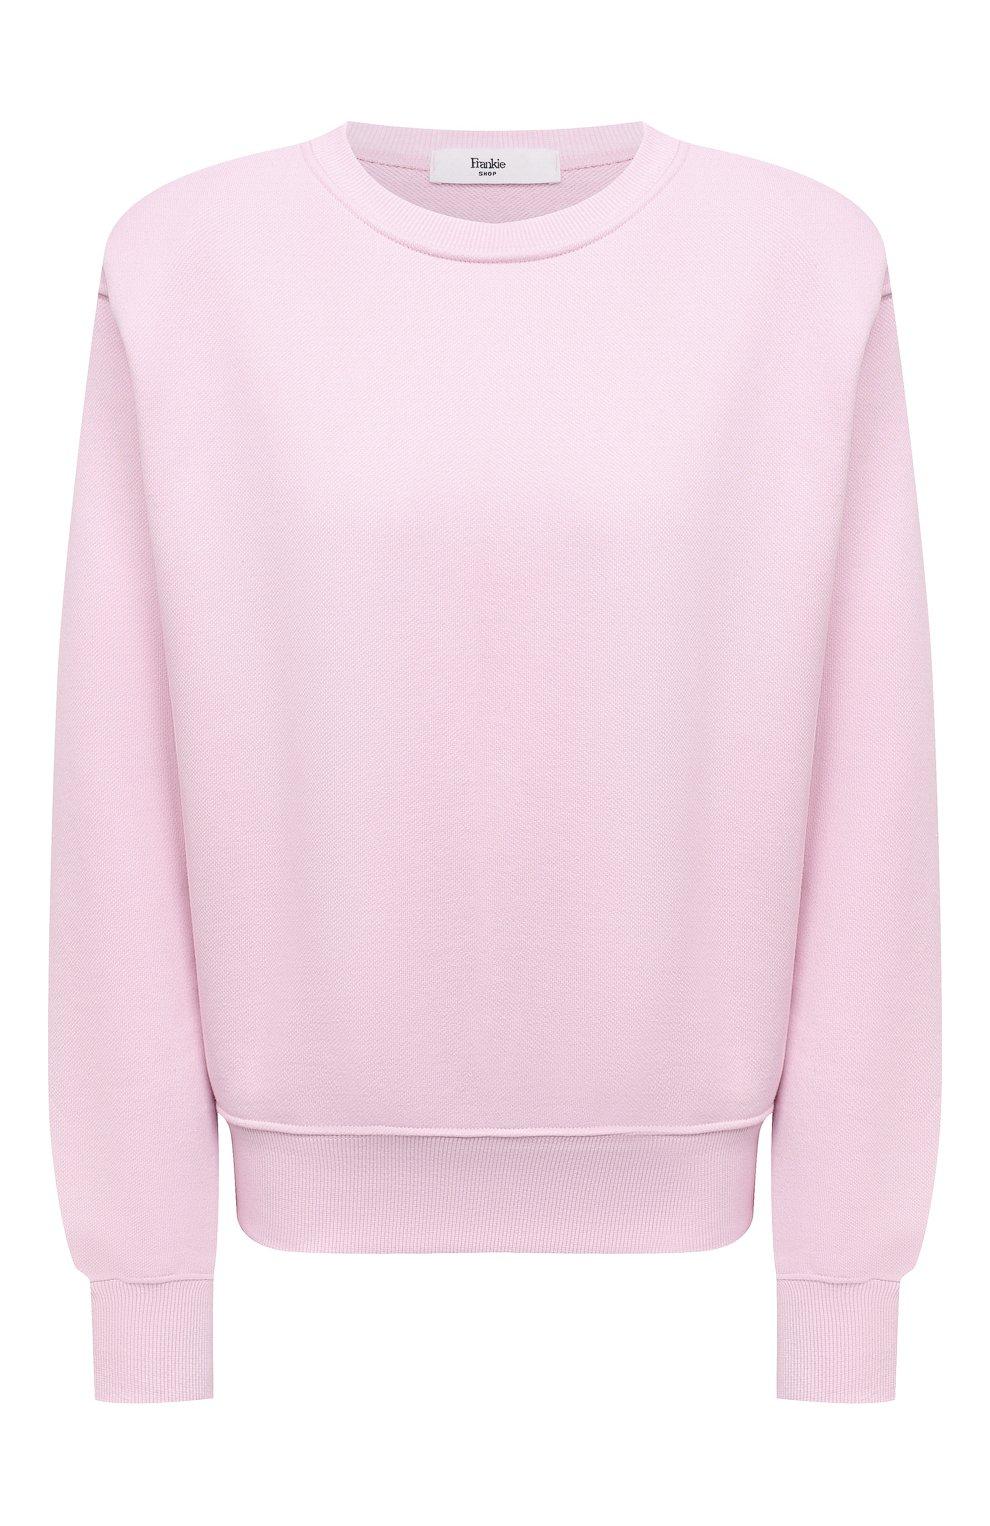 Женский хлопковый свитшот THE FRANKIE SHOP розового цвета, арт. SW VAN KR 08 | Фото 1